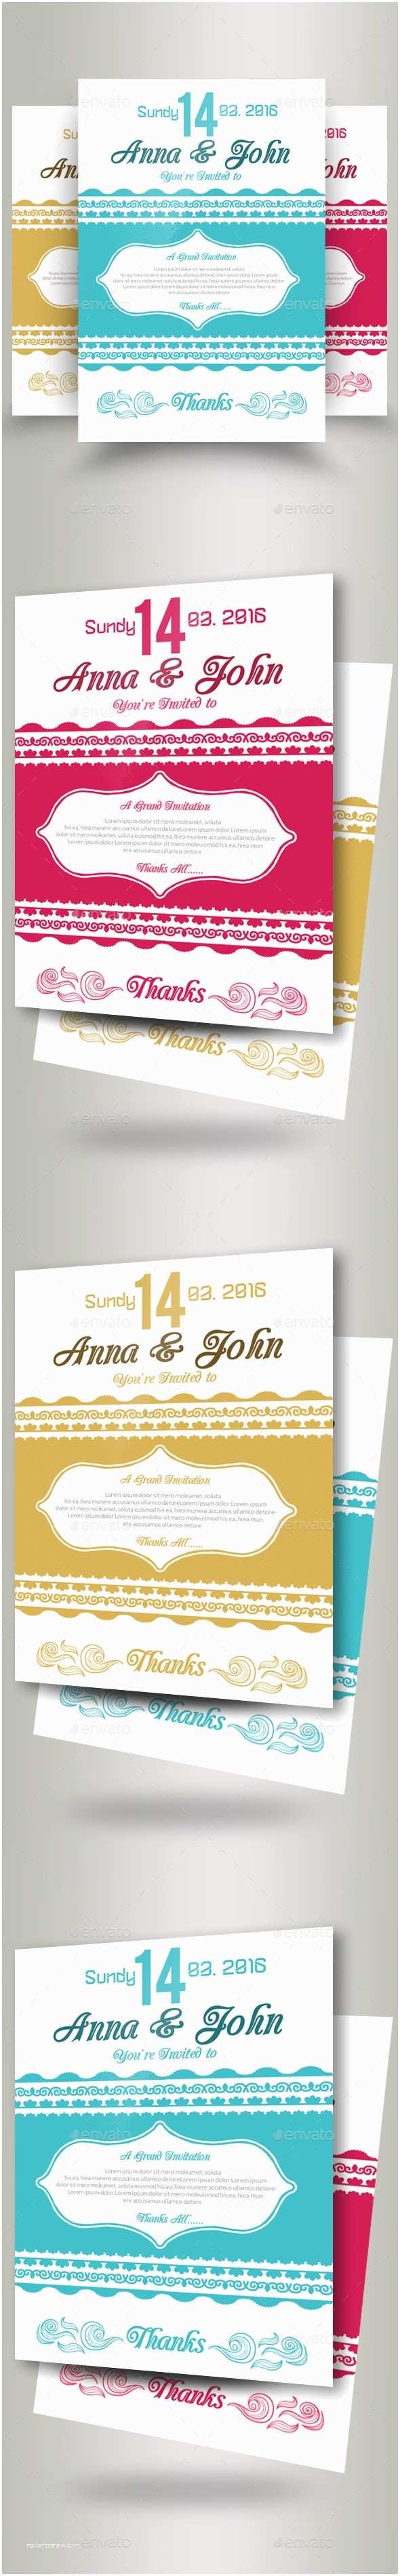 Wedding Invitation Flyer Template Wedding Invitation Flyer Template by Designhub719